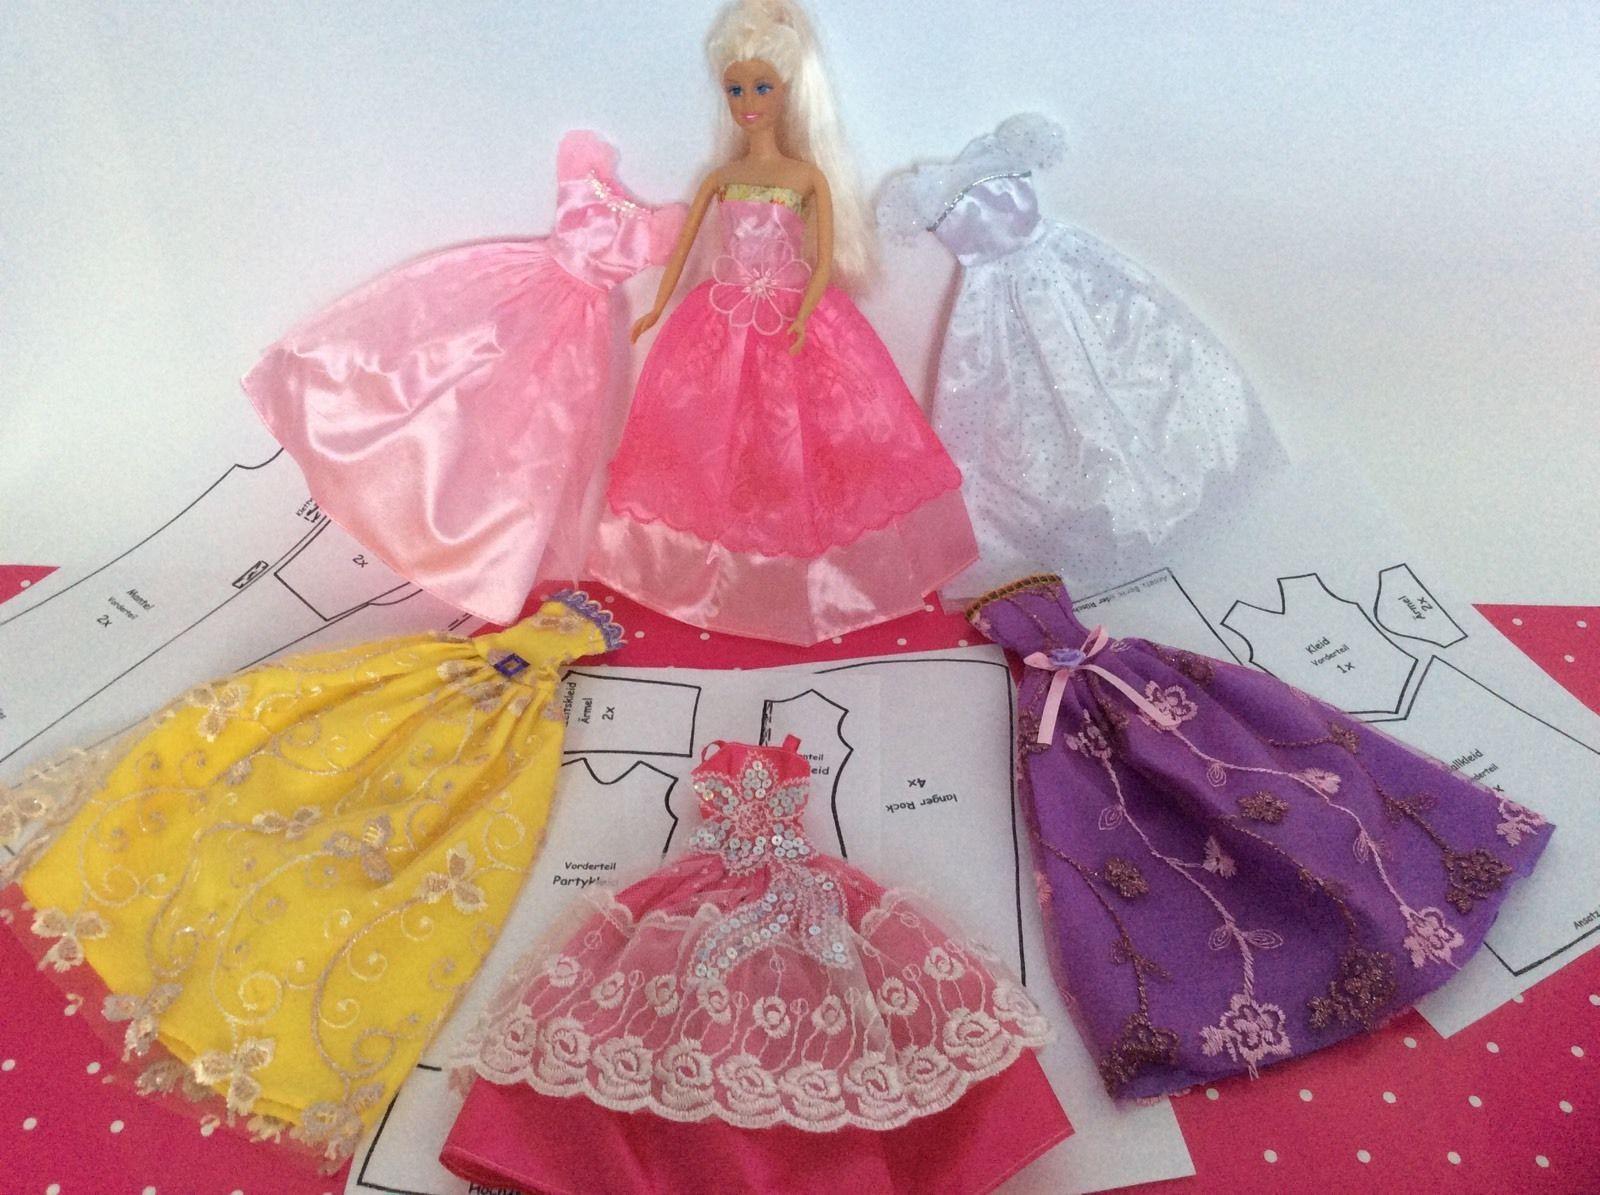 Großes SET Schnittmuster Puppenkleidung für Mode Puppen 29cm - 30cm ...